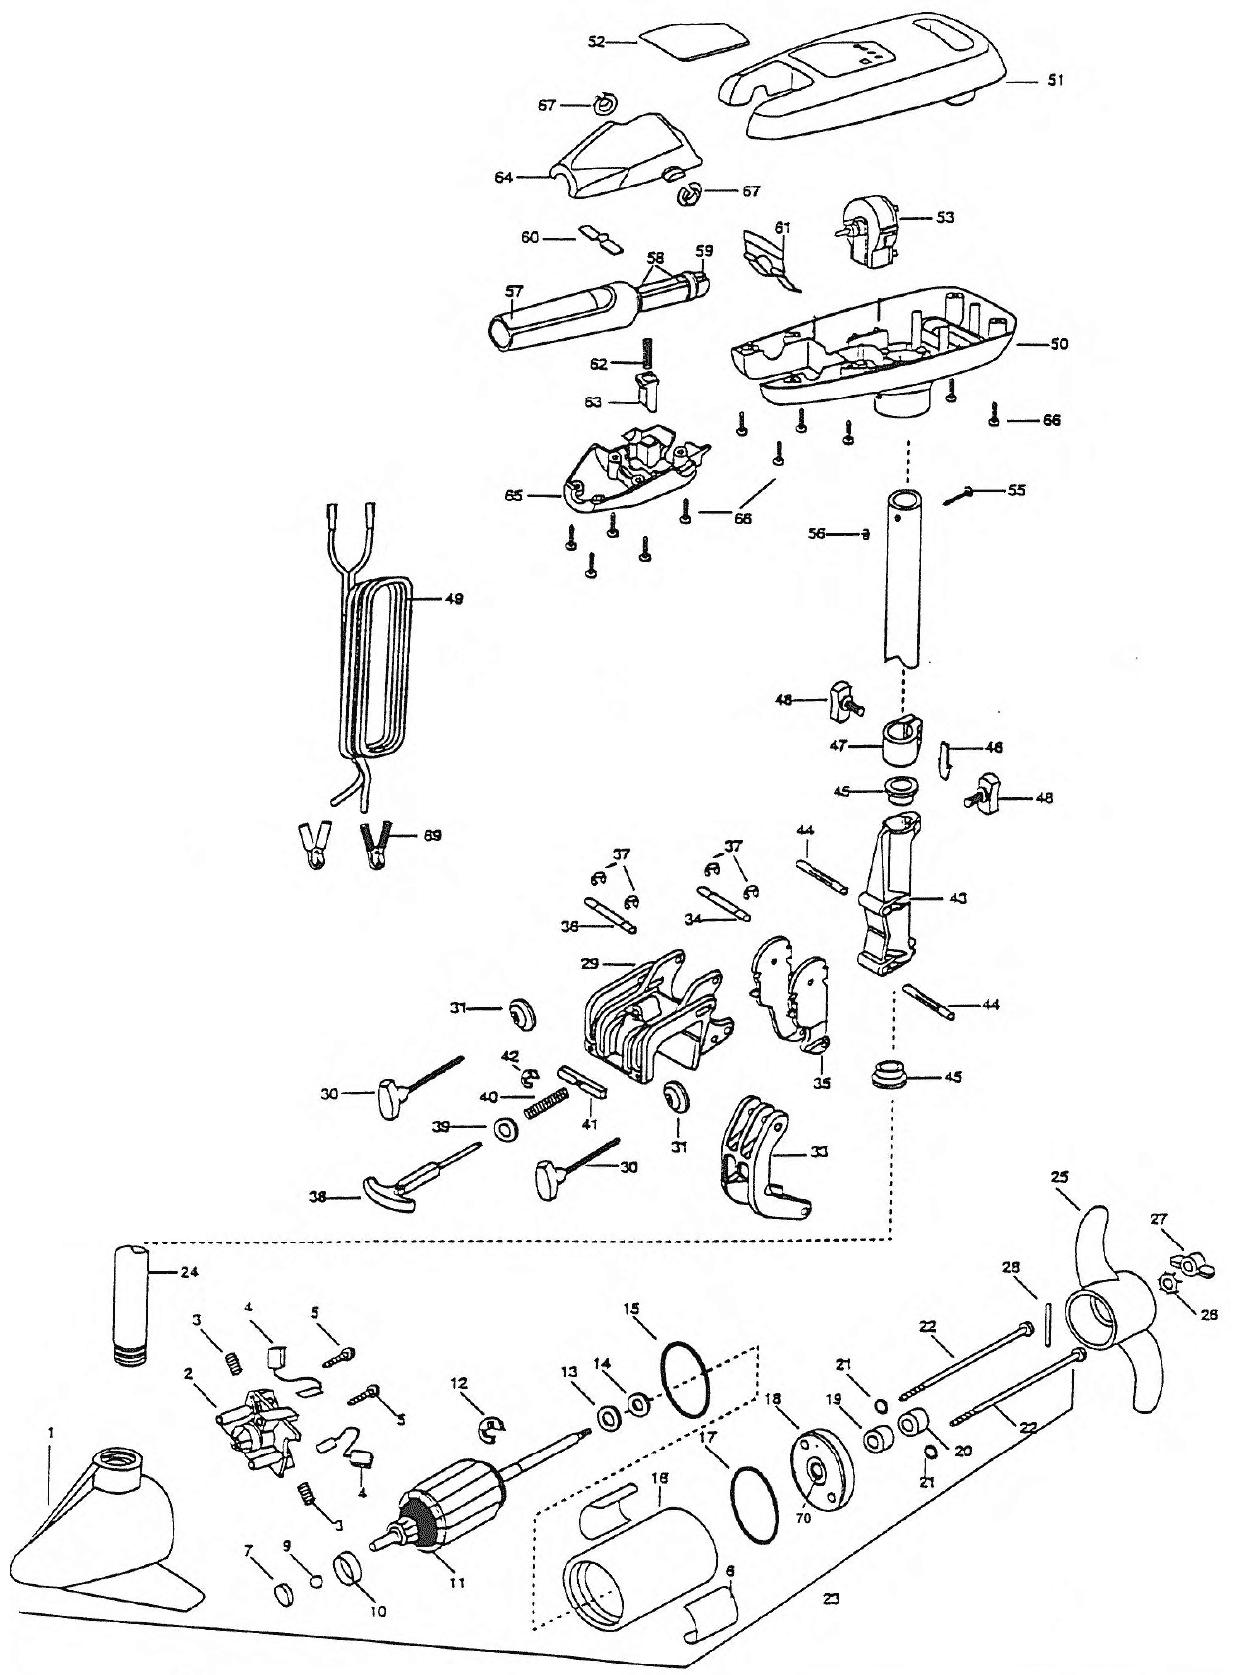 minn kota riptide 27s parts 1998 from. Black Bedroom Furniture Sets. Home Design Ideas